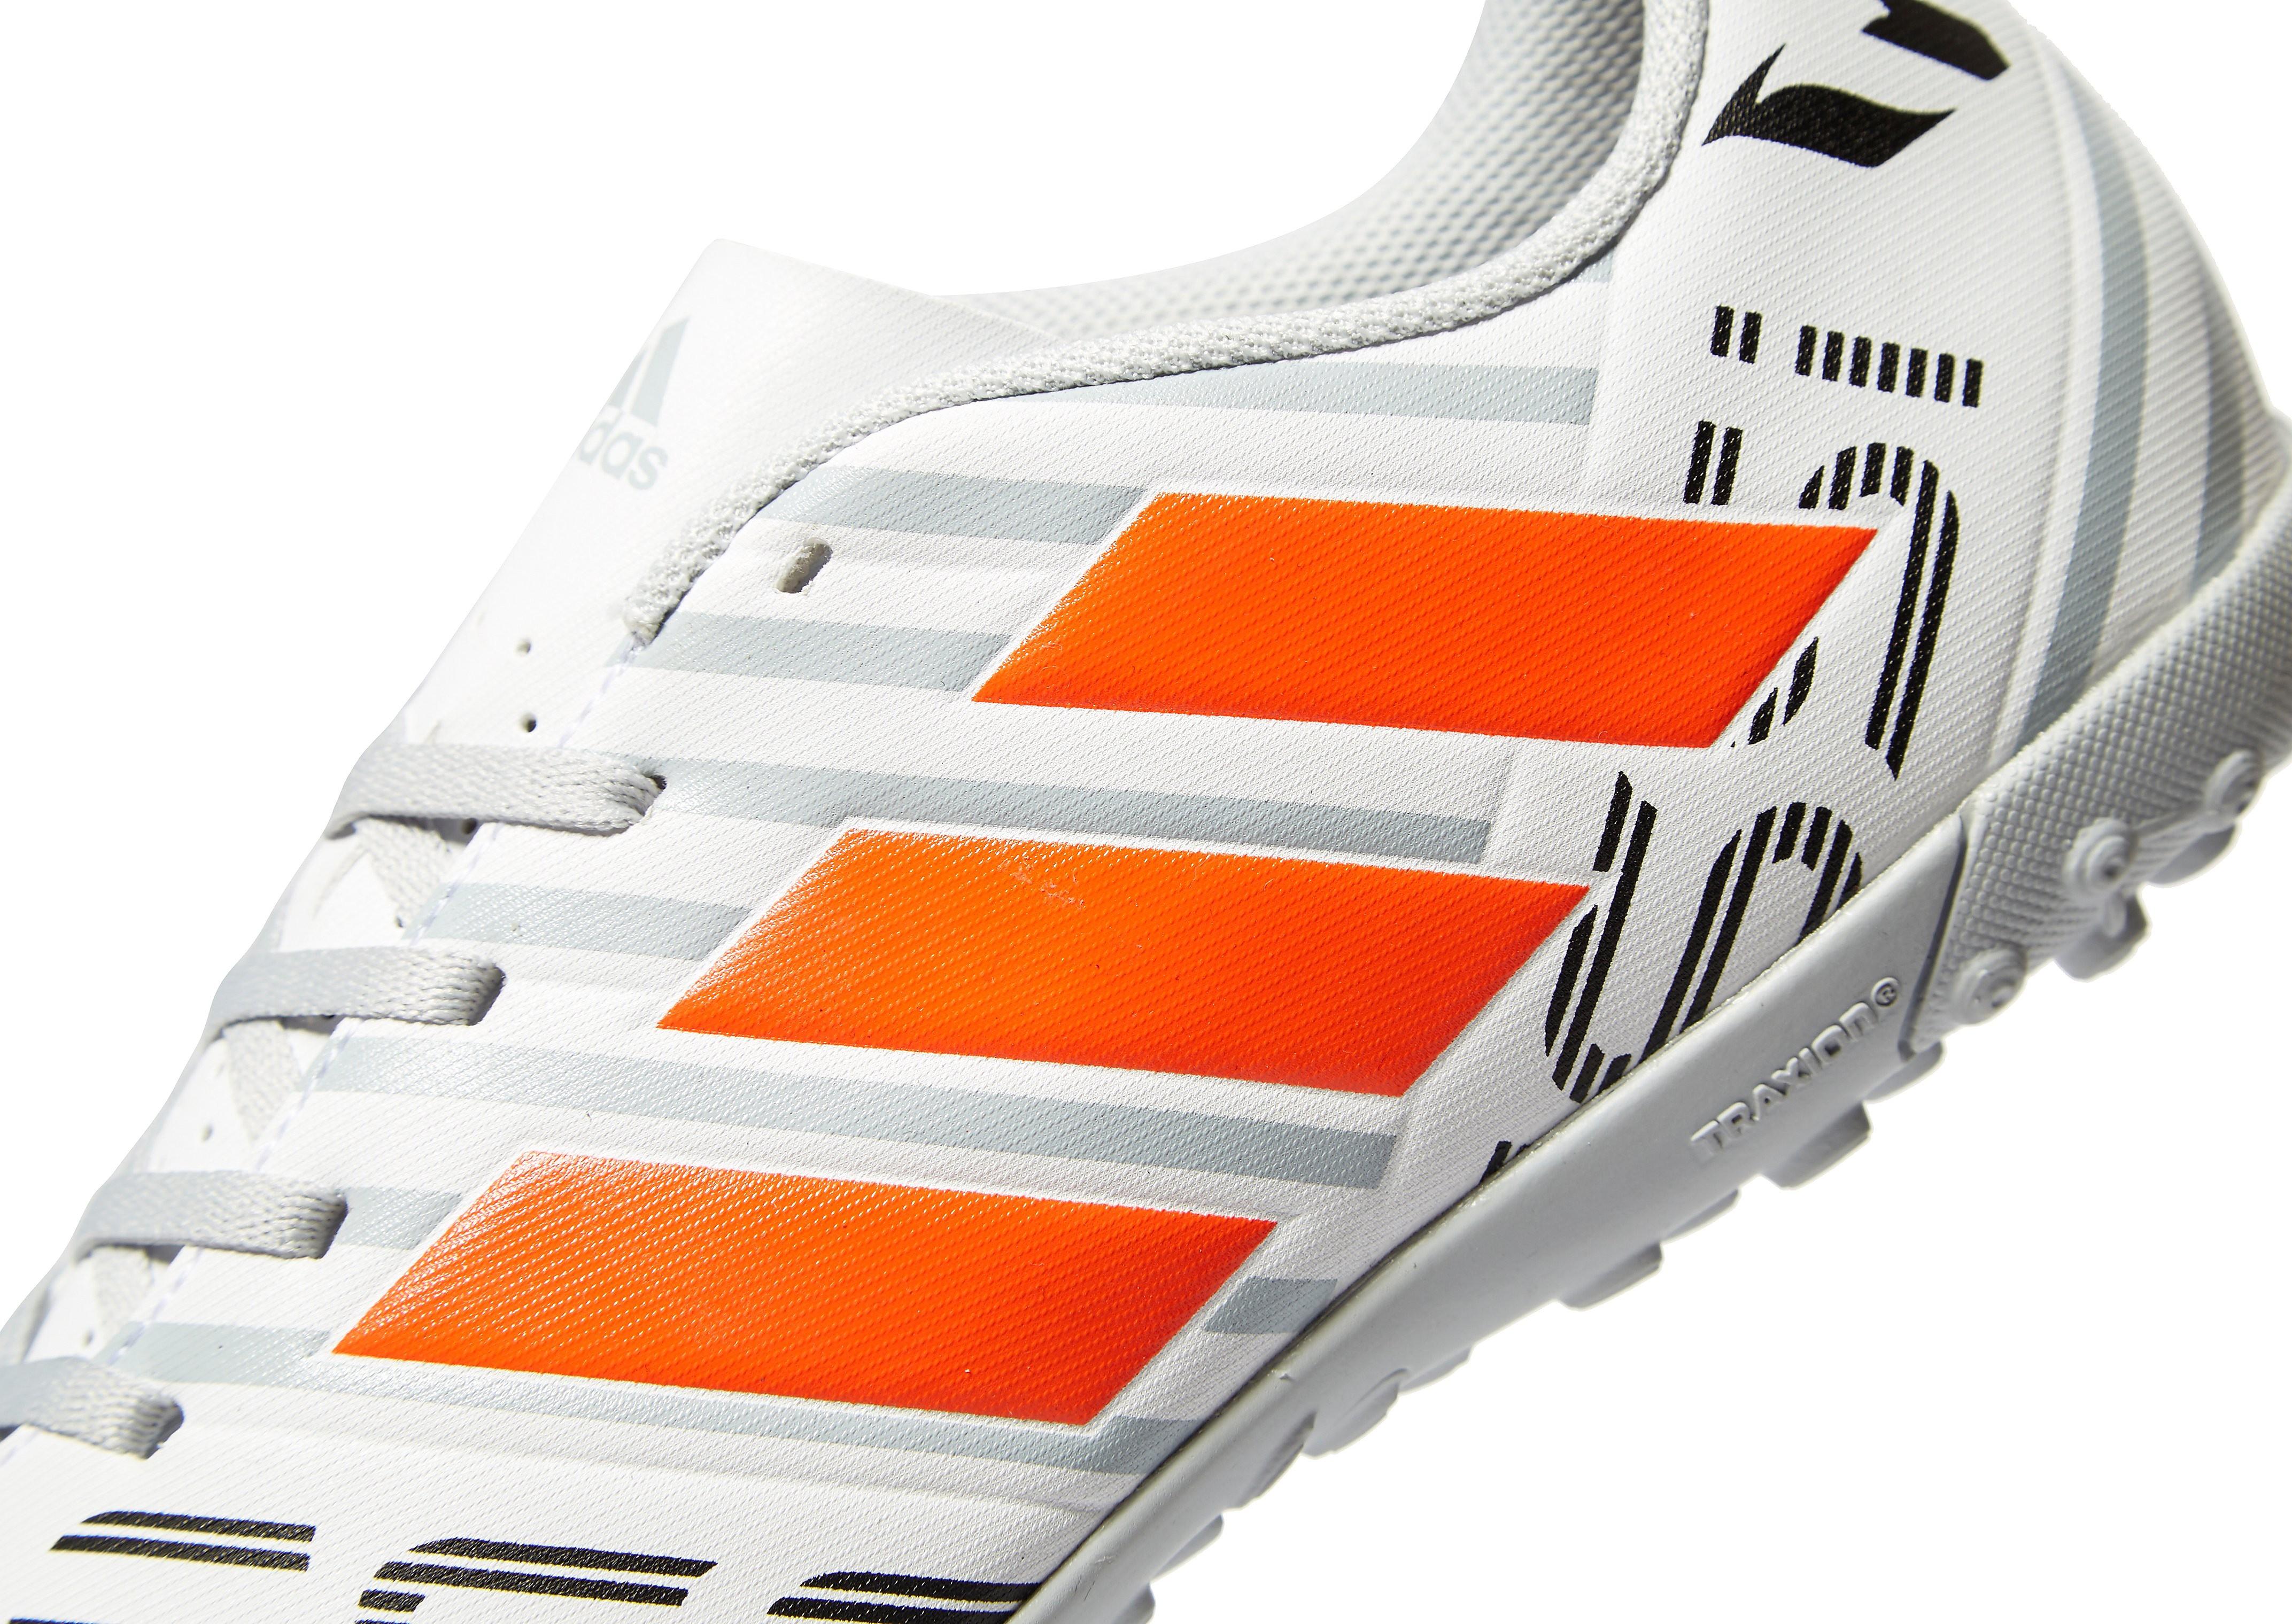 adidas Pyro Storm Nemeziz Messi 17.4 TF